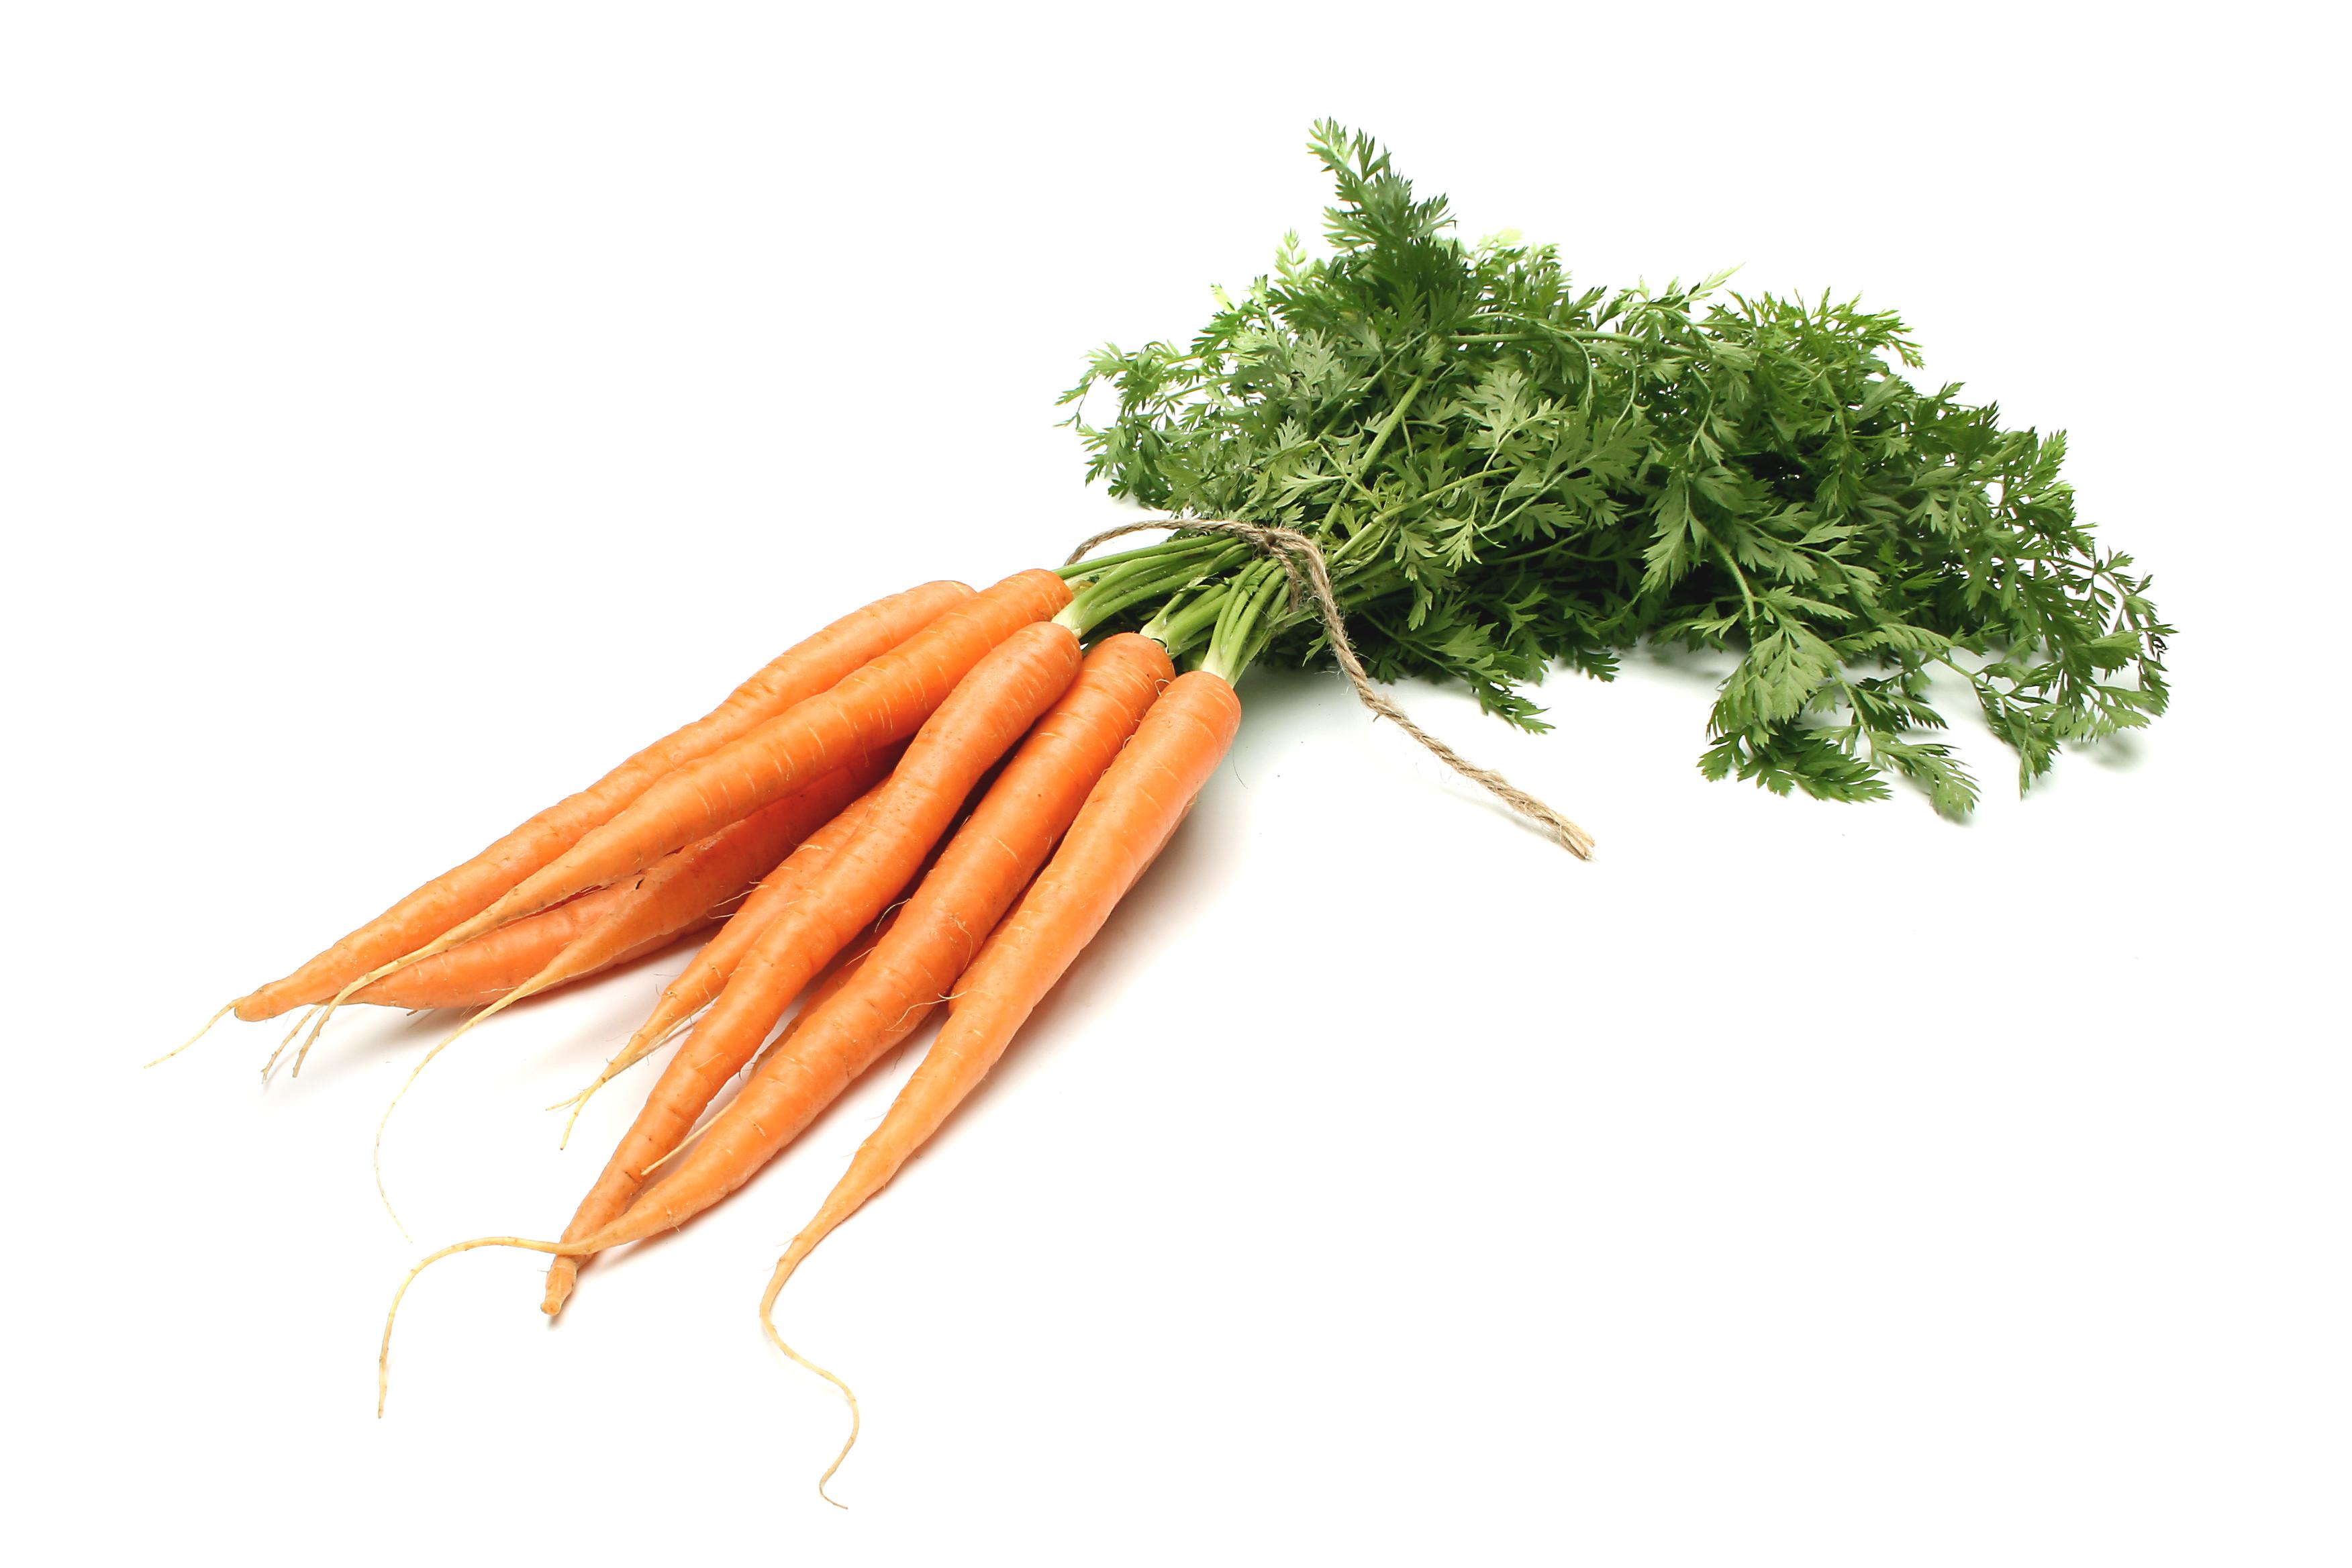 Ar užteks vien morkų regėjimui sustiprinti?